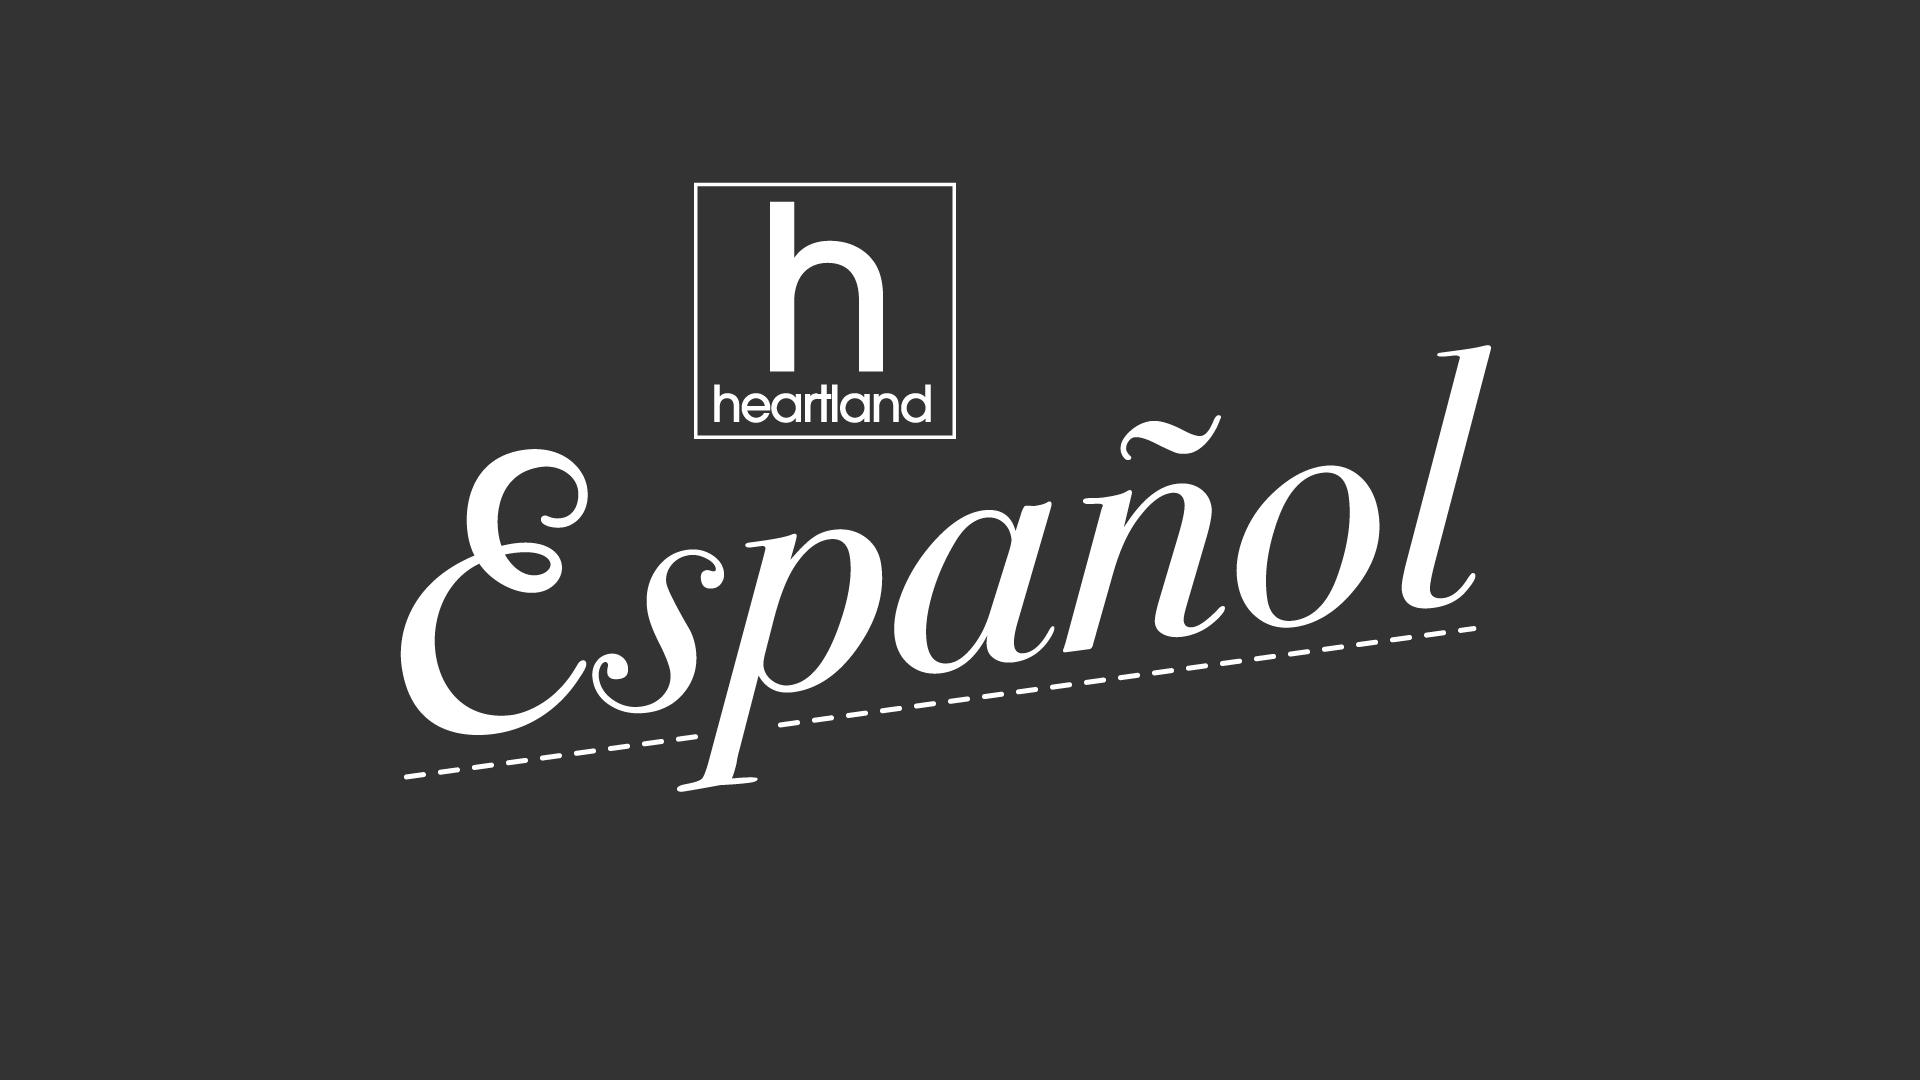 Heartland en Español